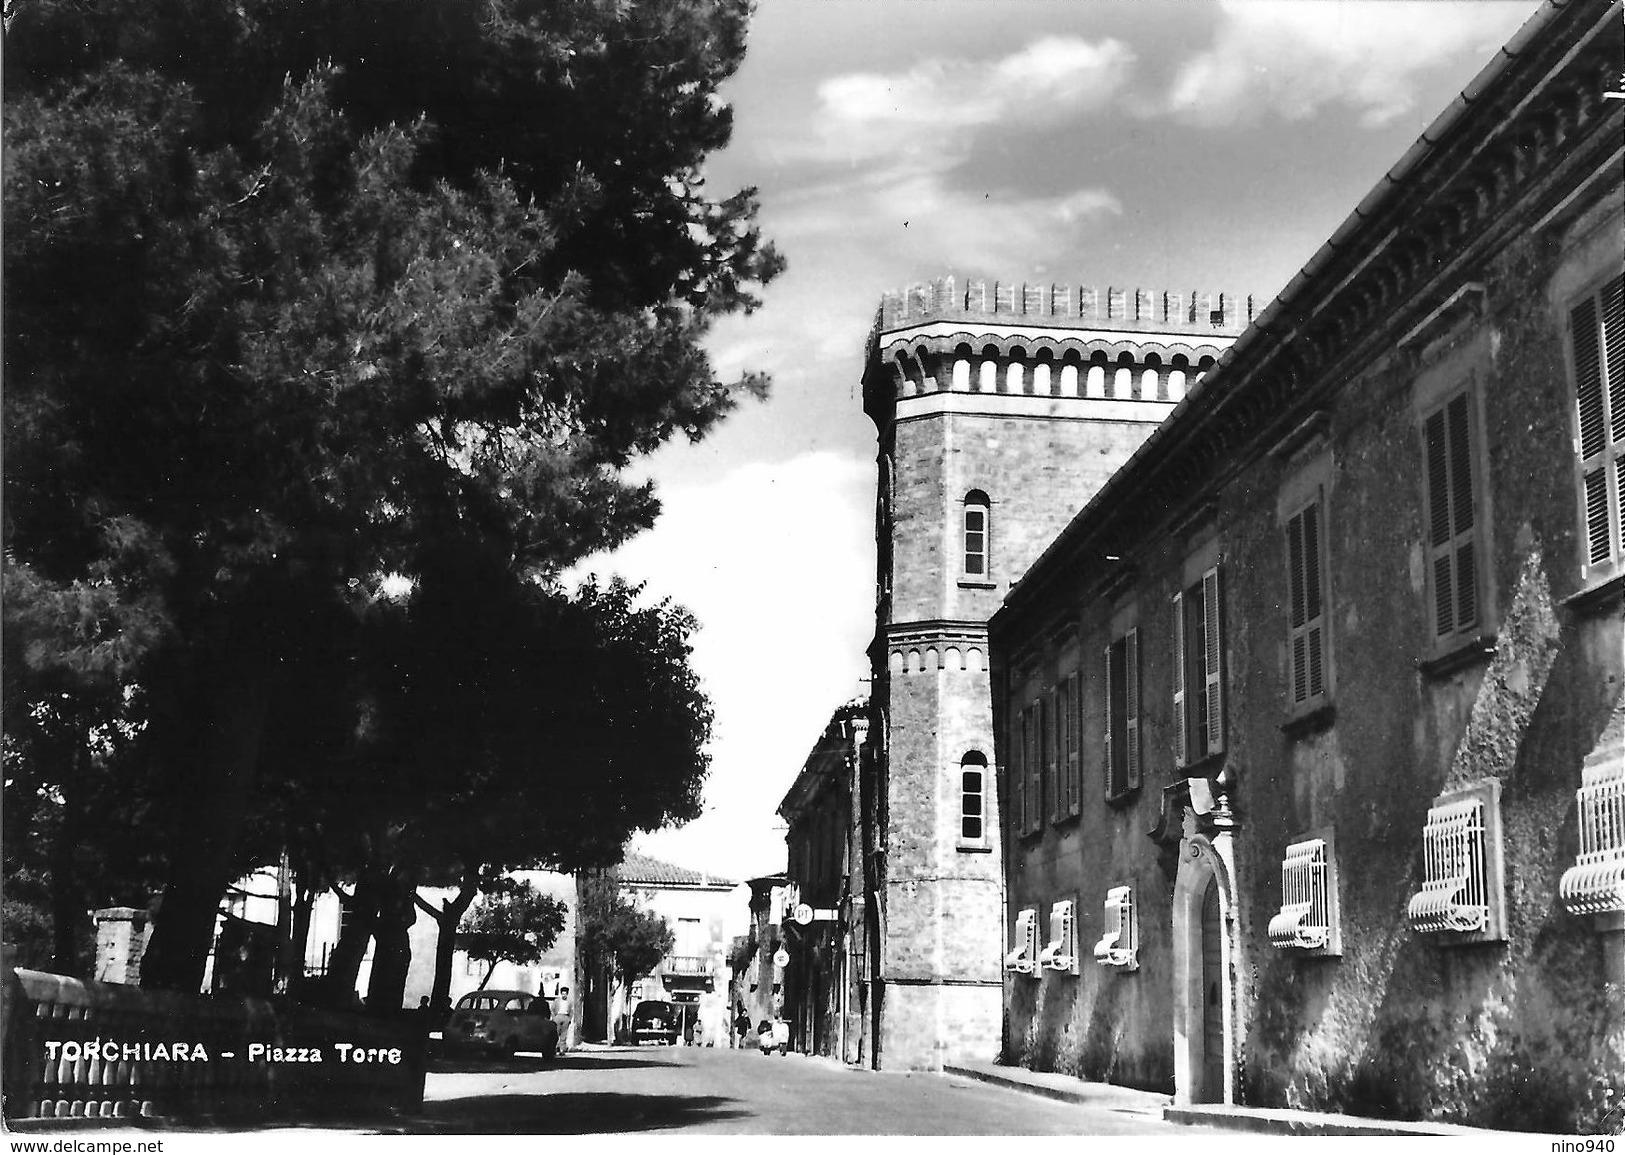 TORCHIARA (SA) - PIAZZA TORRE  - F/G - V.: 1965 - Italie